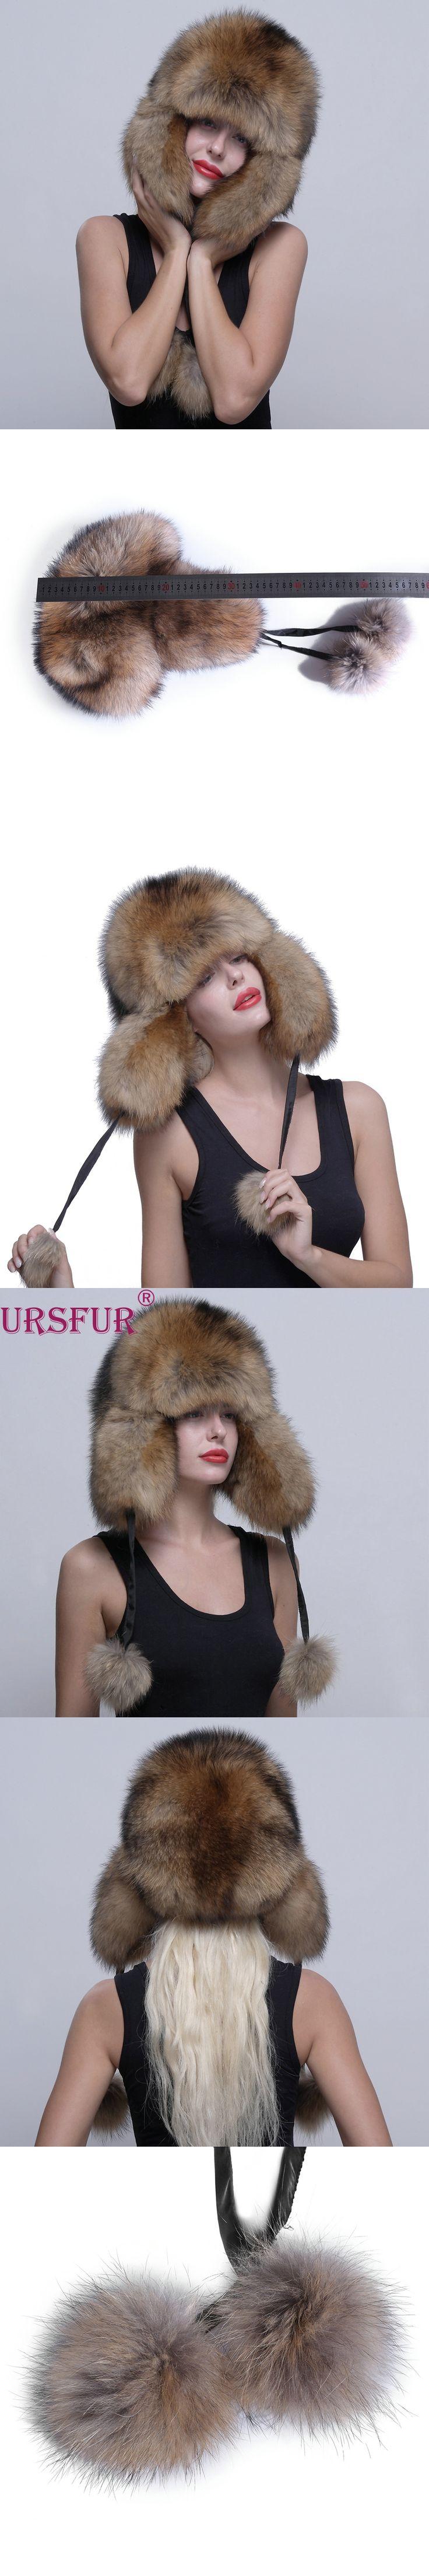 URSFUR Genuine Raccoon Fur Hat Russian Ushanka Trapper Hat Cap with Fur Ball Pompom Ear-flaps Soft And Warm Bomber Hats